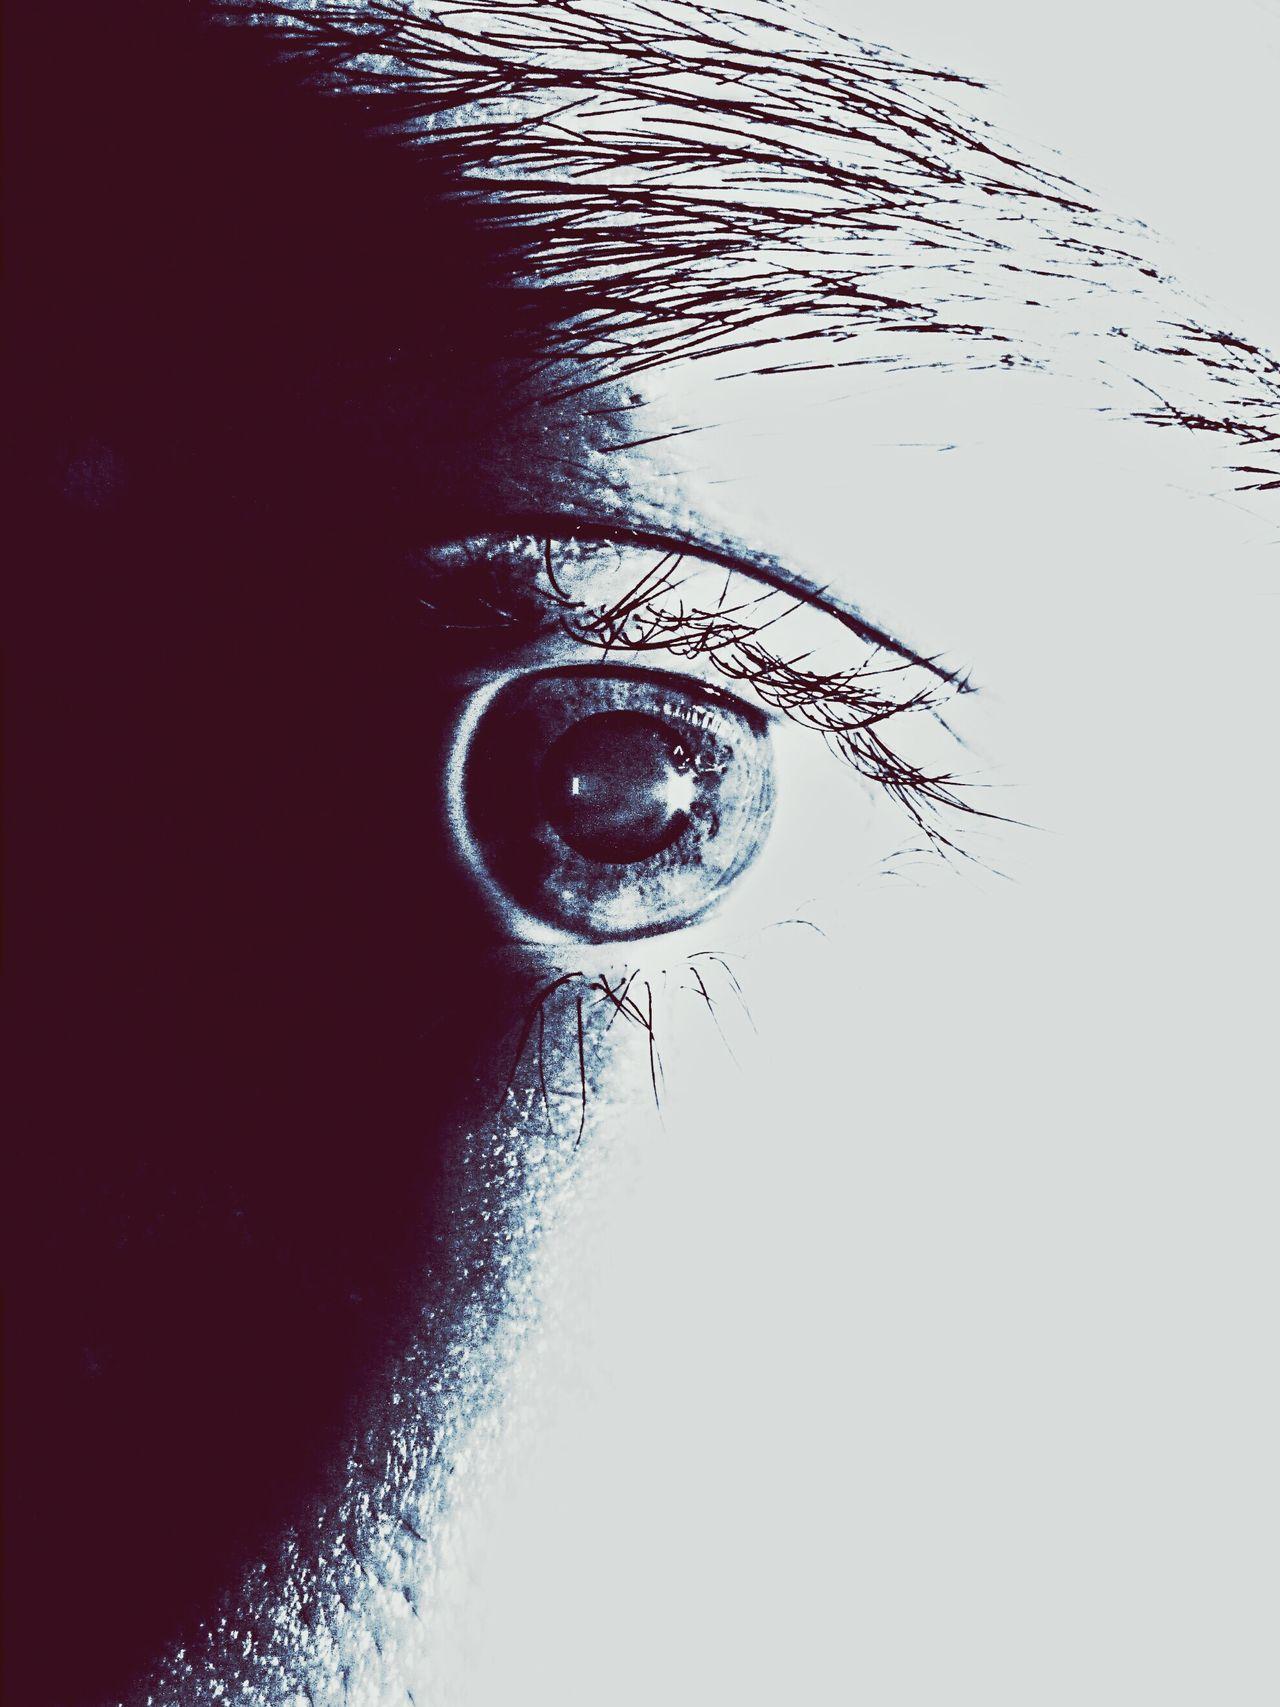 magical iris No People Outdoors Close-up EyeEmNewHere GERMANY🇩🇪DEUTSCHERLAND@ EyeEm Best Shots Taking Photos City Life Germany Human Eye Eyelash Indoors  Adult Eyesight Villingen-schwenningen Young Adult Adults Only Human Face One Person Enjoying Life Love EyeEm Best Shots - Nature Eyebrow